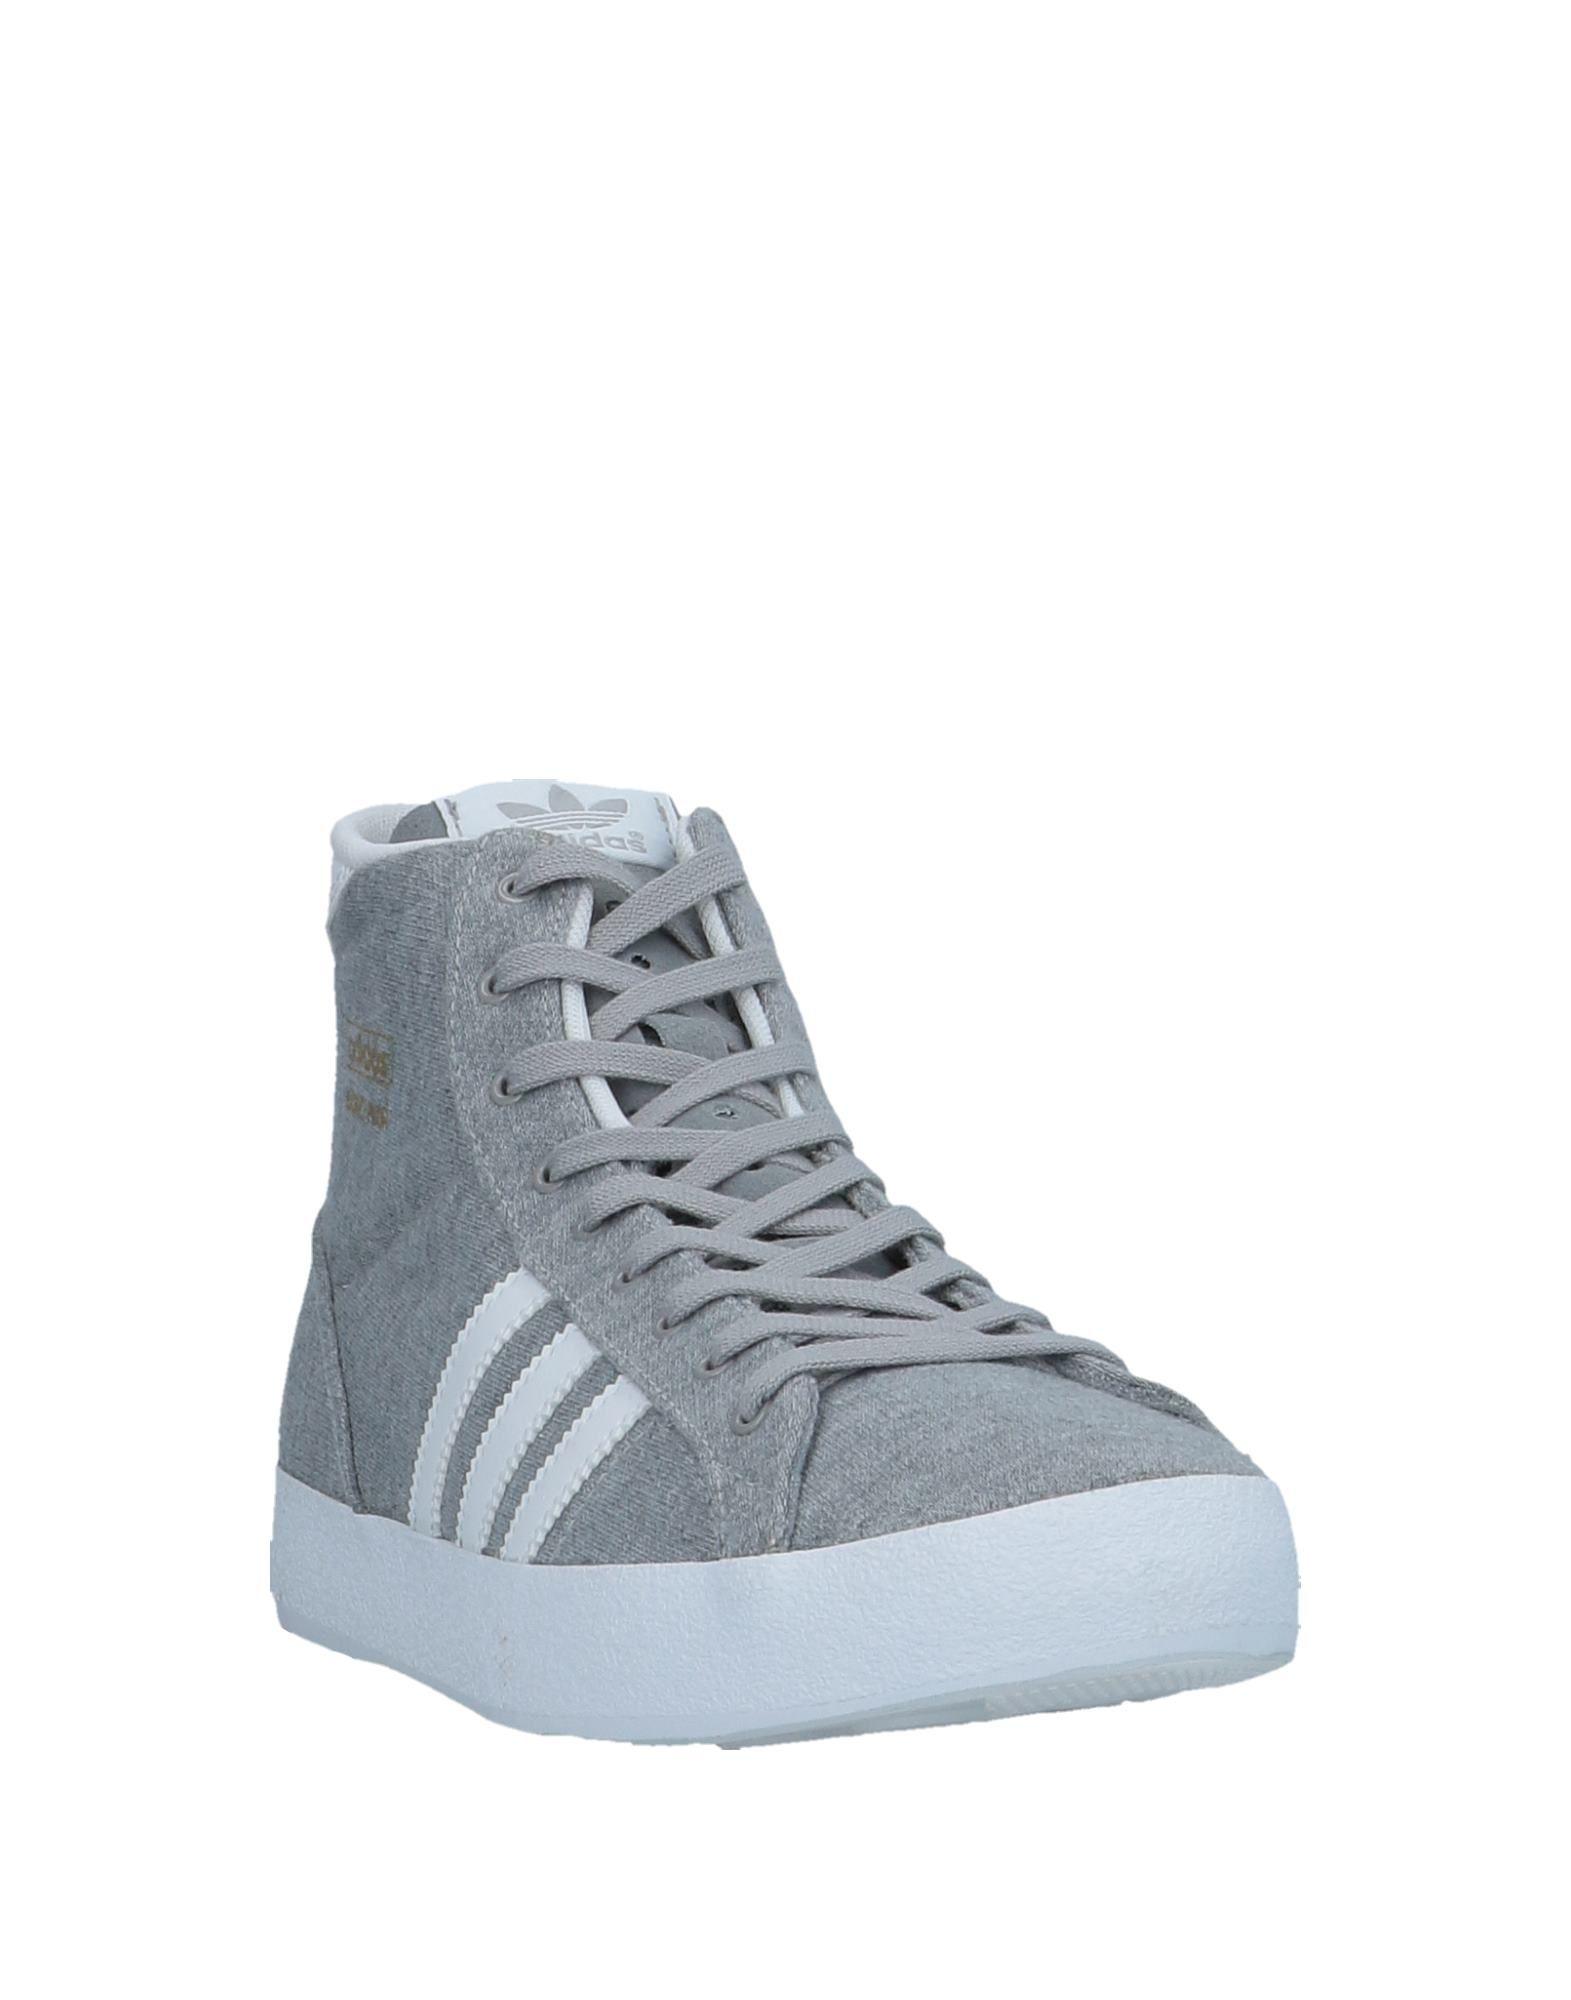 Adidas Originals Sneakers Damen  11538402GV 11538402GV 11538402GV Gute Qualität beliebte Schuhe efcdfc